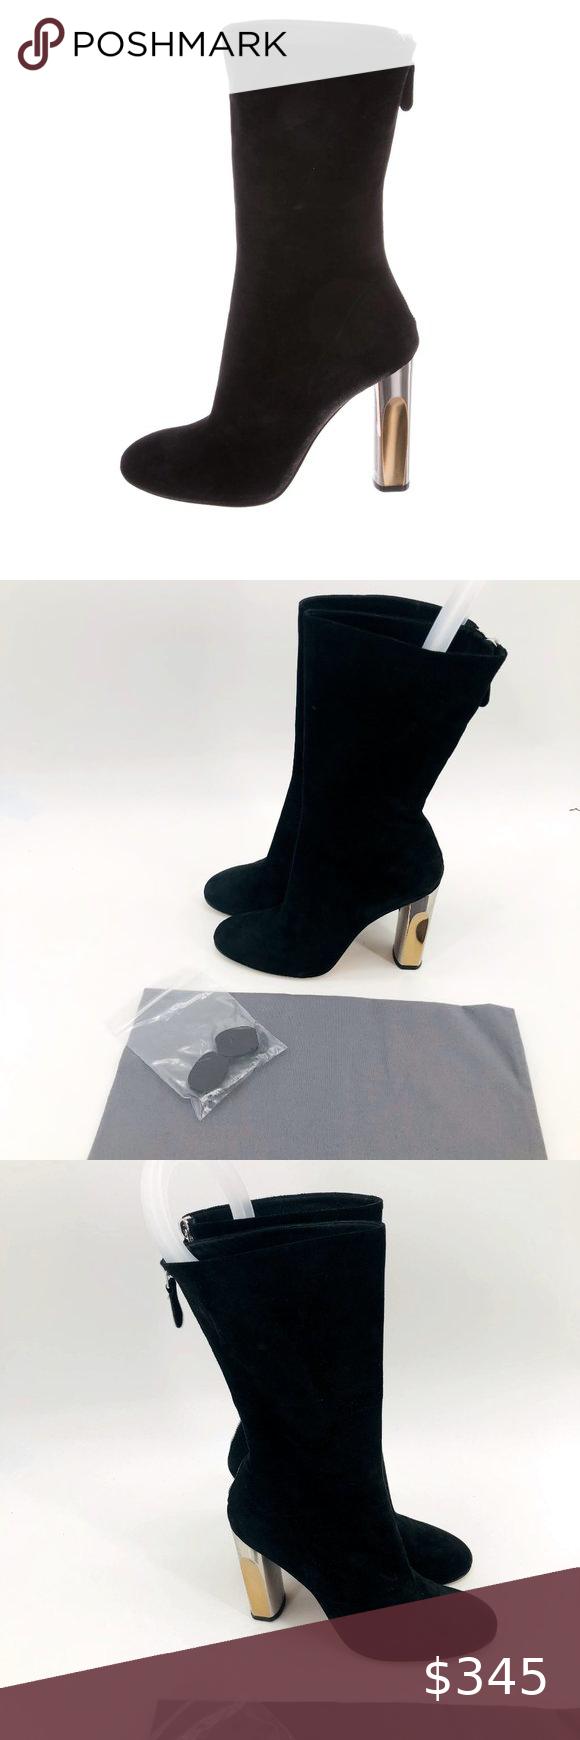 ALEXANDER MCQUEEN Sculpted Heel Boots 8